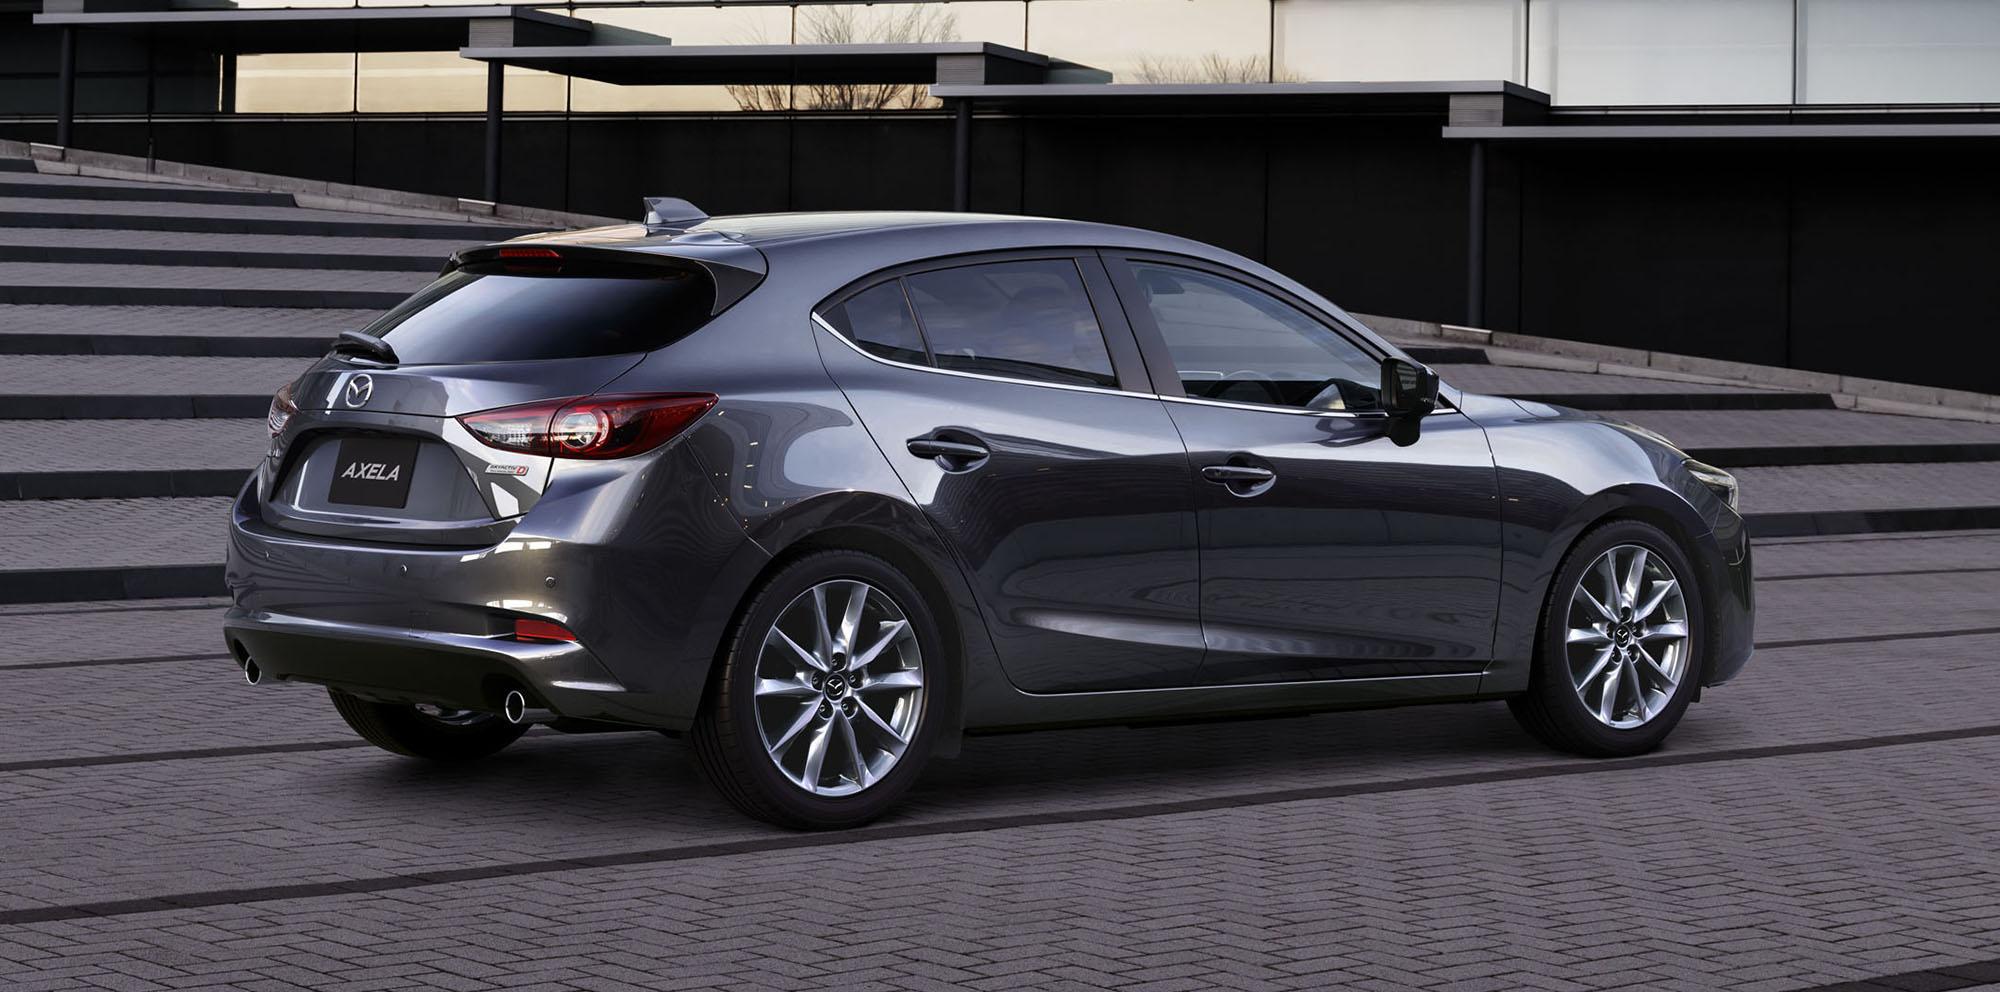 2017 Mazda 3 Facelift Unveiled Arrives In Australia August